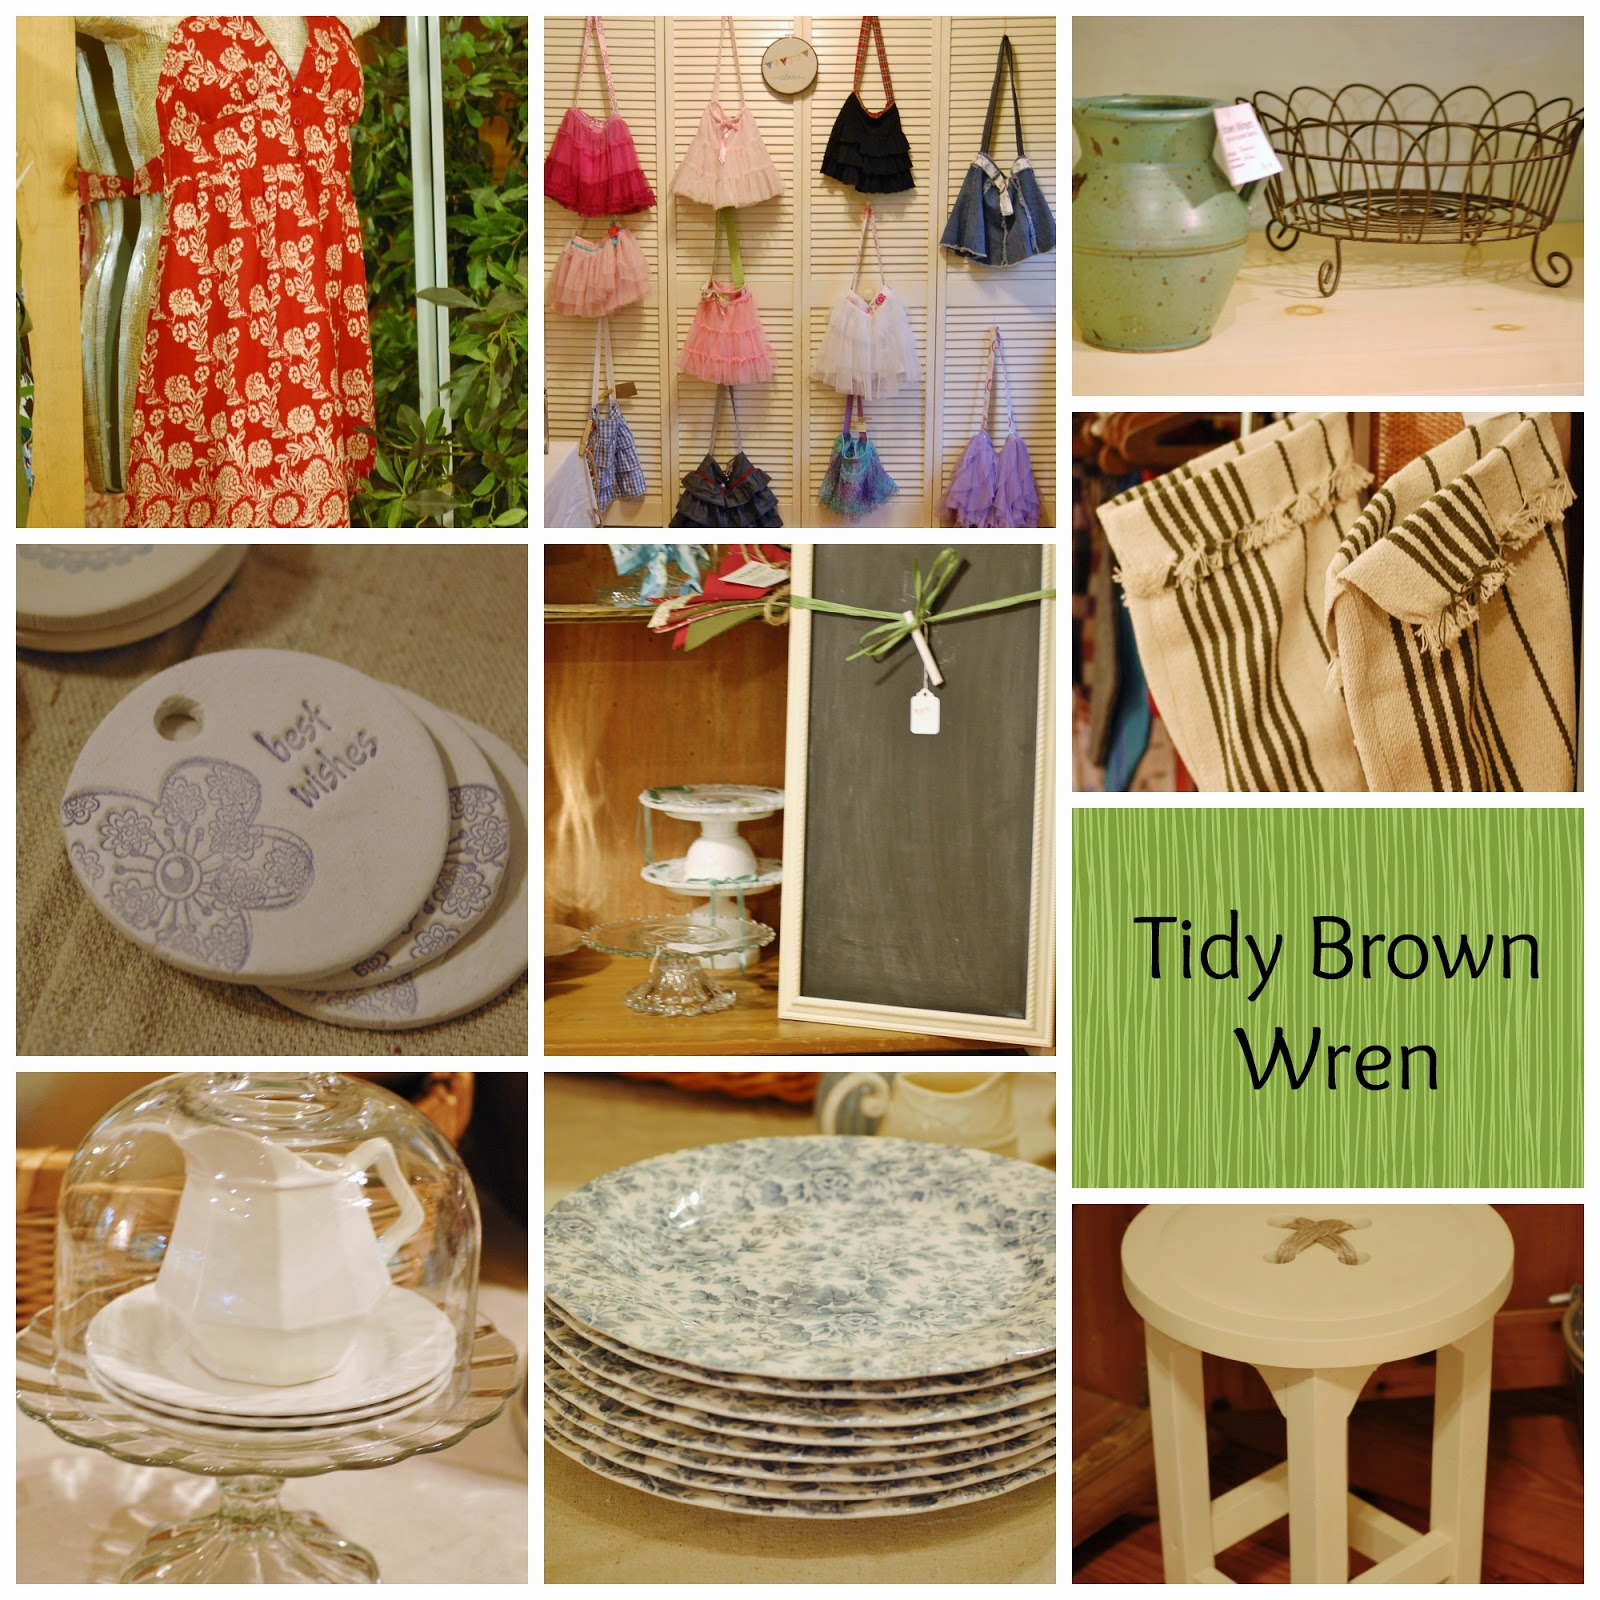 tidybrownwren.blogspot.com